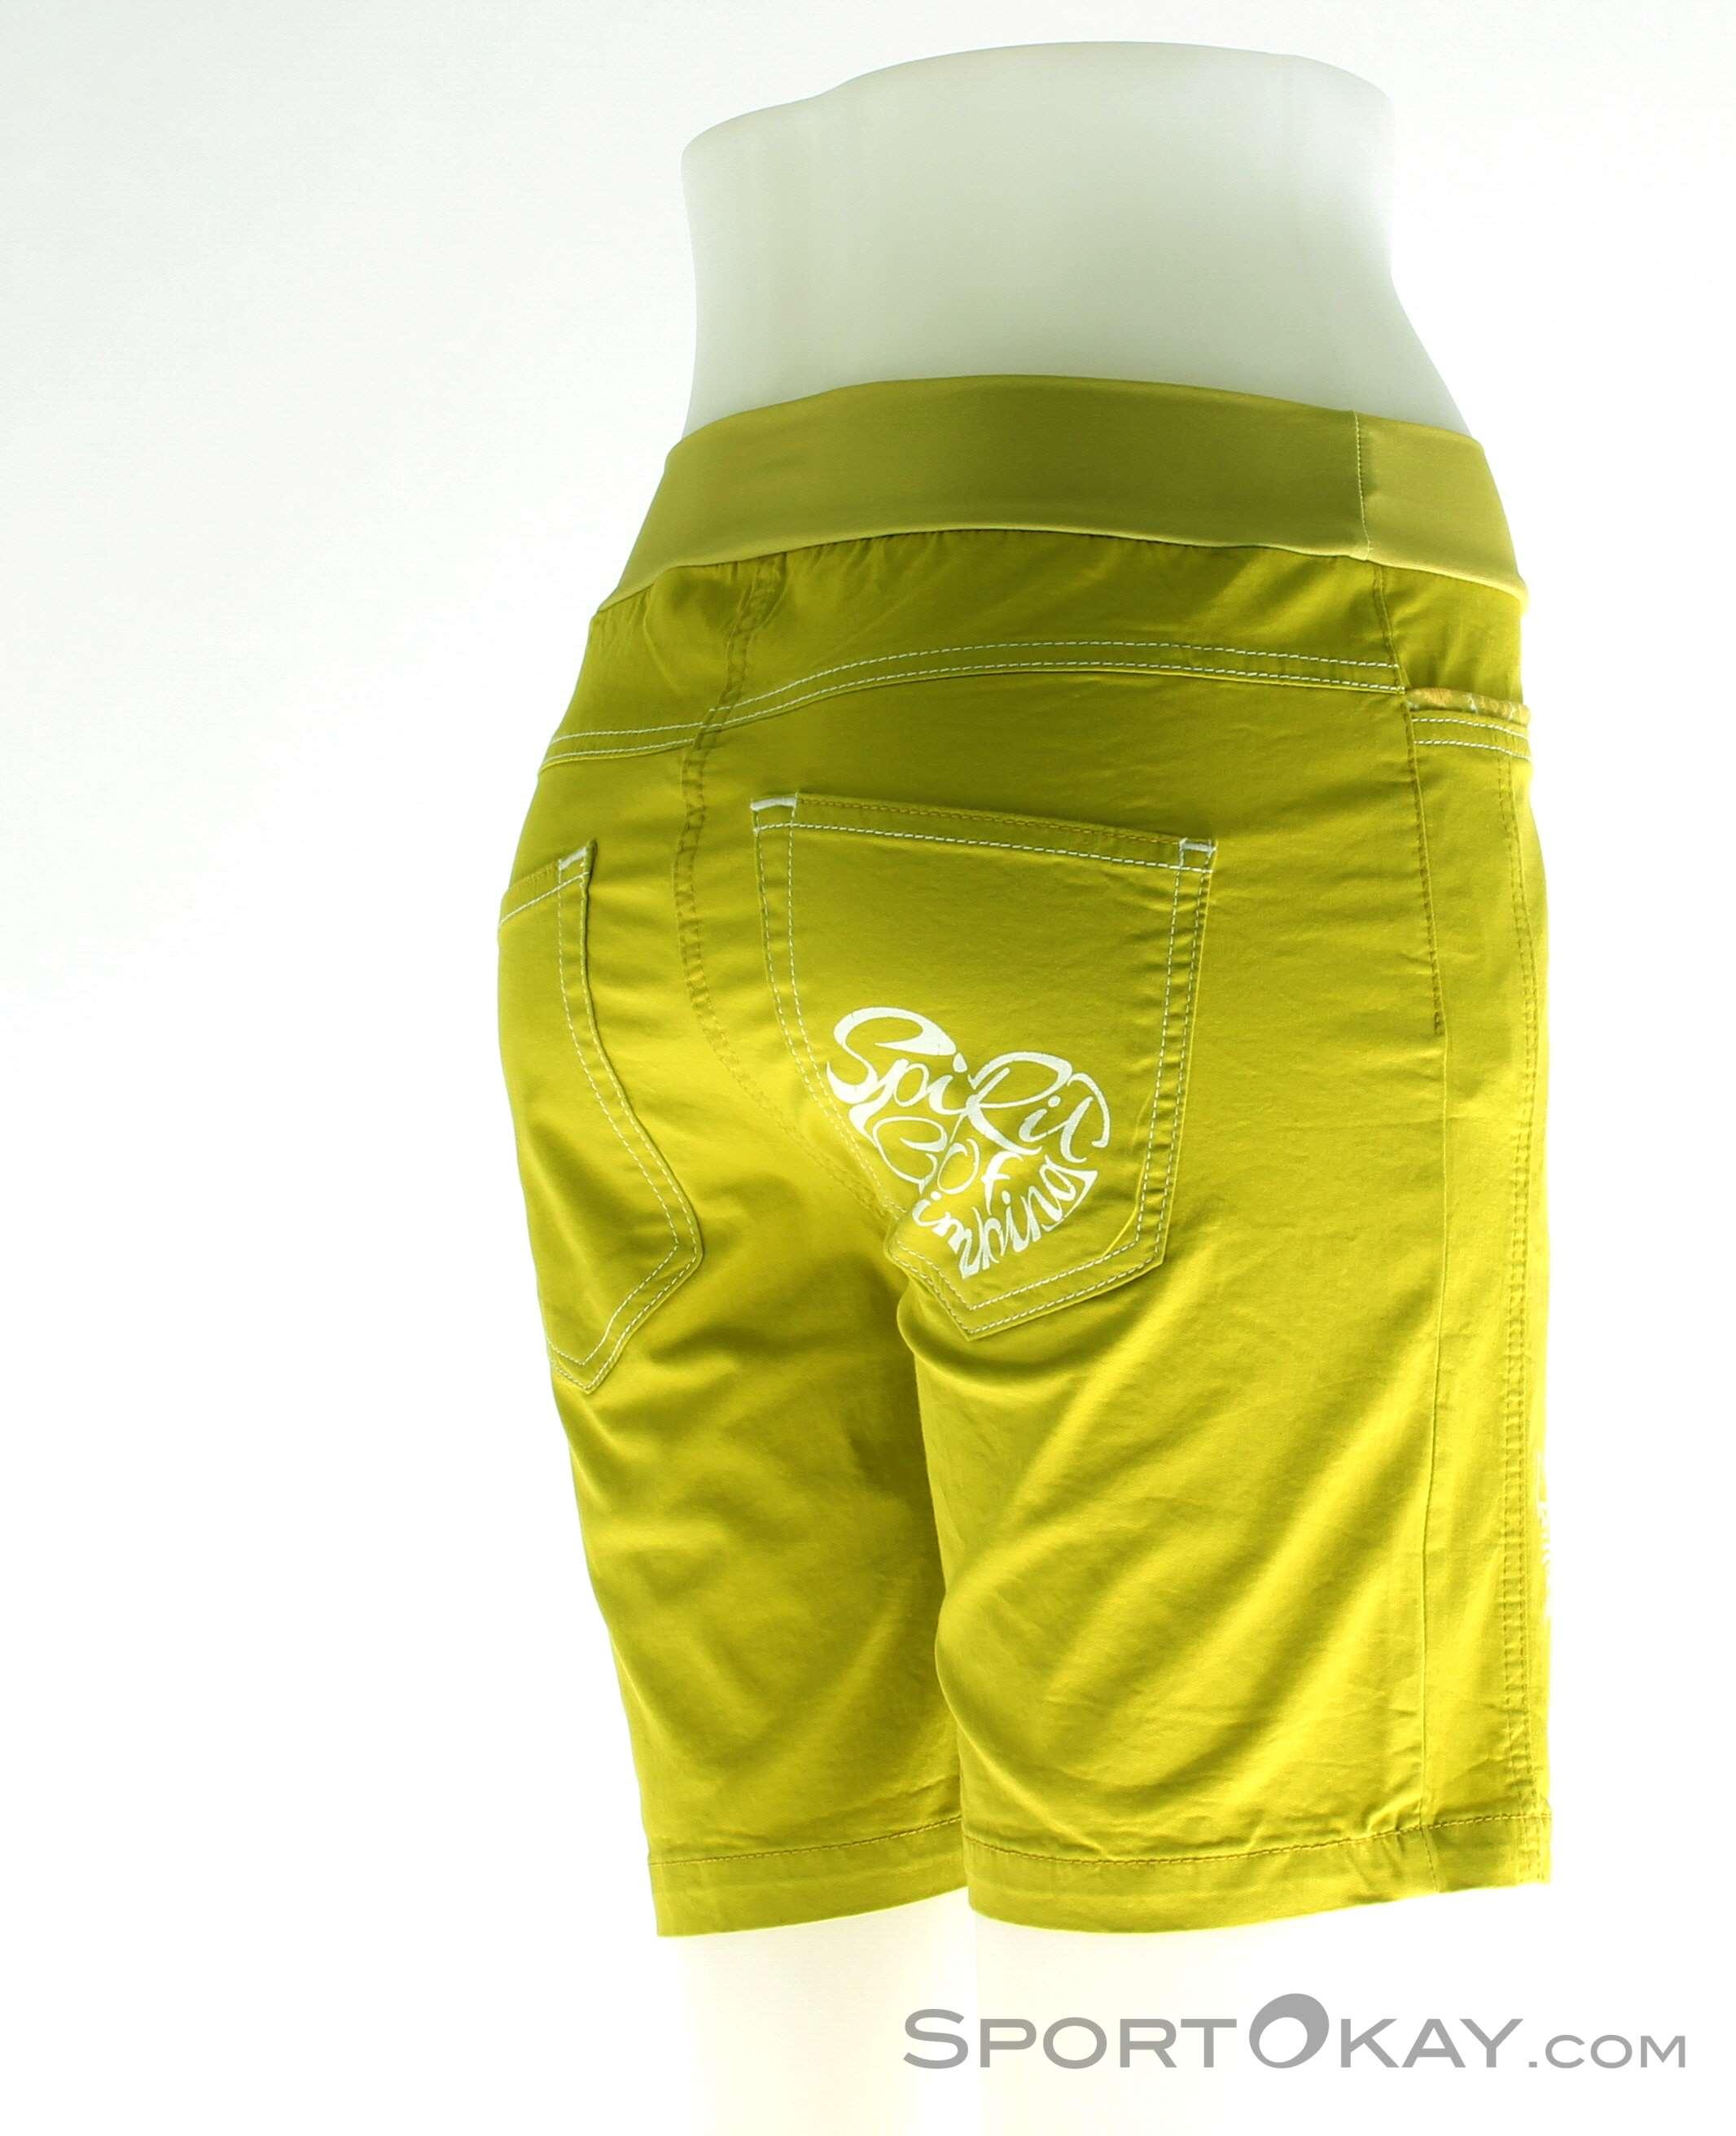 Marmot Marmot Cabrera Short Donna Pantaloni da Arrampicata